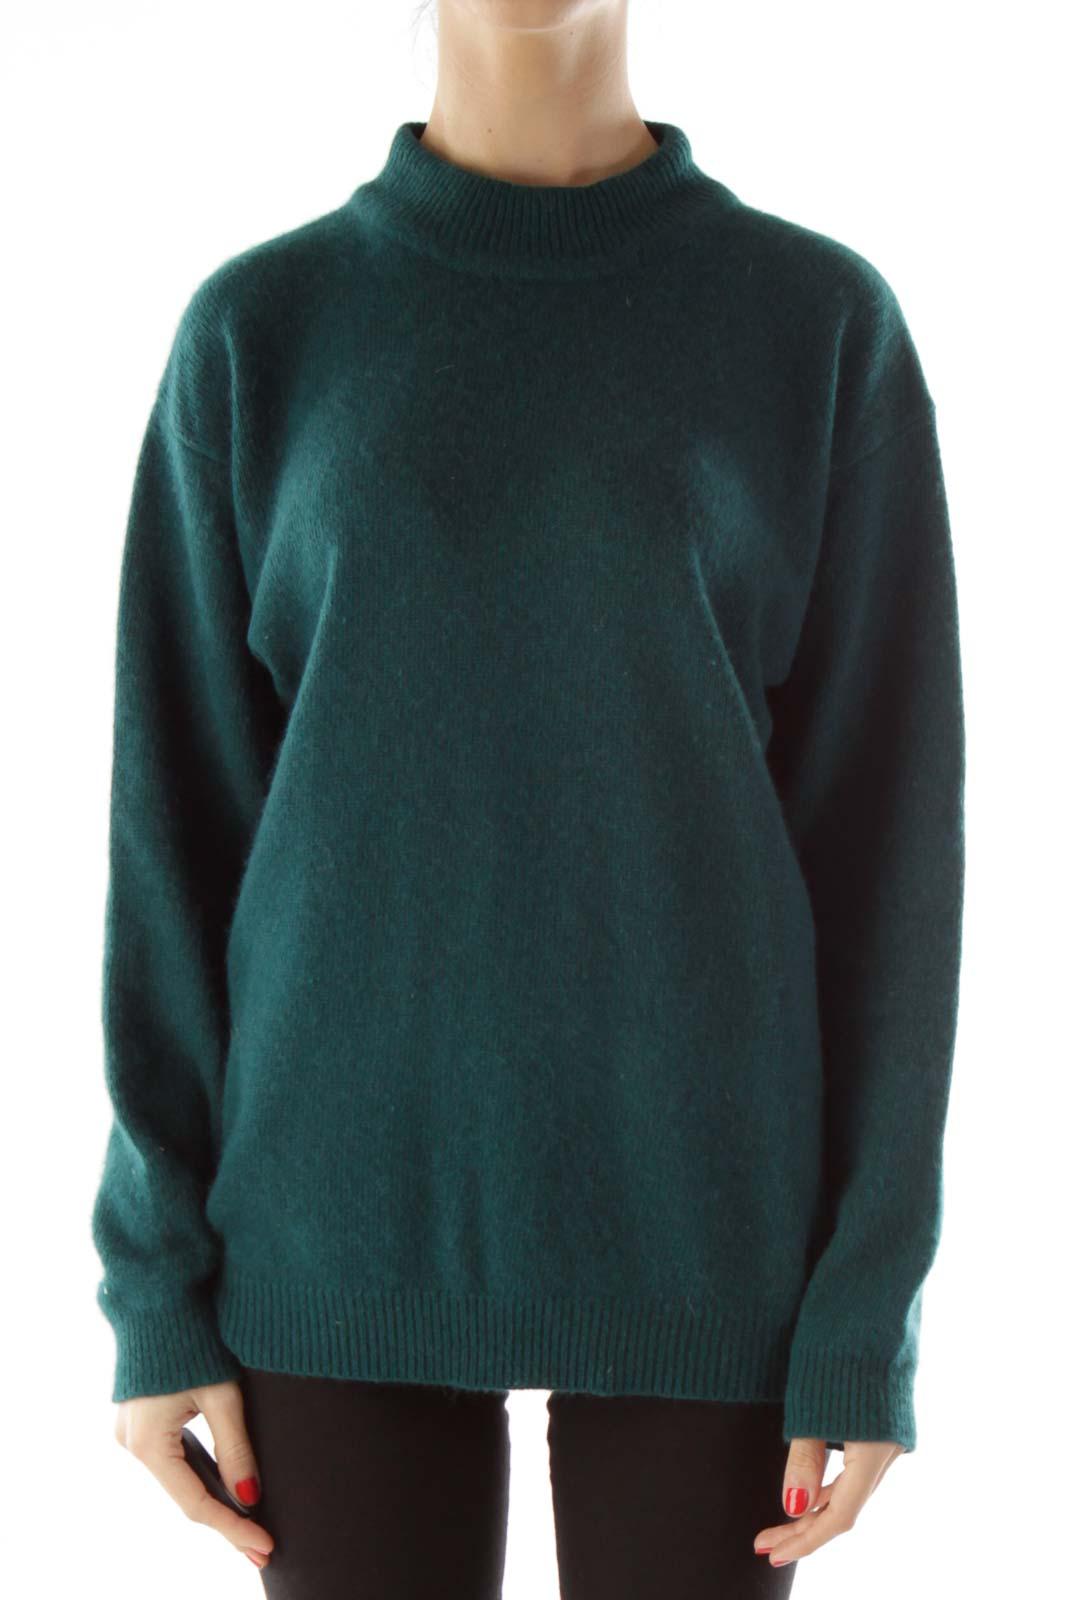 Green Knit Mock Turtleneck